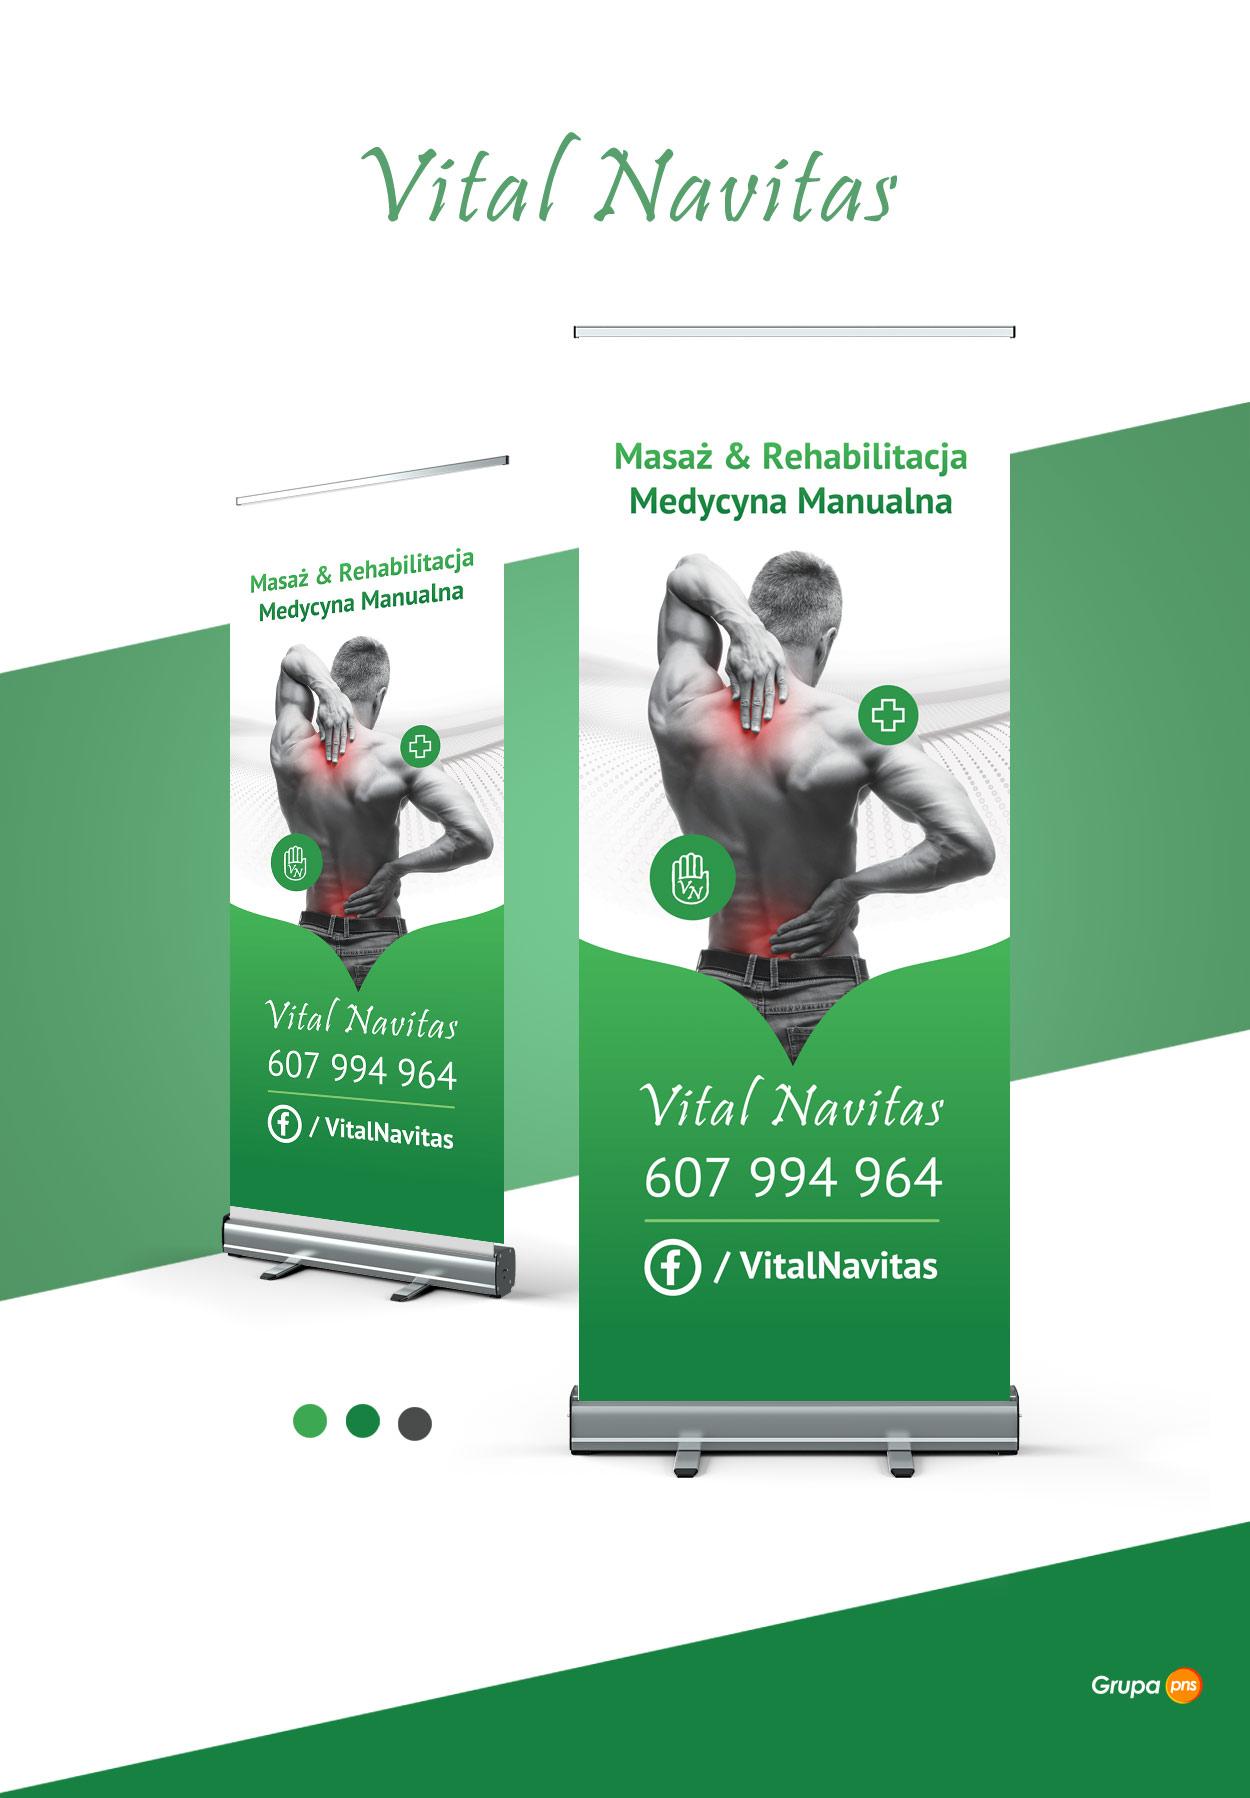 projekt graficzny rollupa salon rehabilitacji vital naviles - Projekt rollup dla gabinetu masażu i rehabilitacji - Vital Navitas